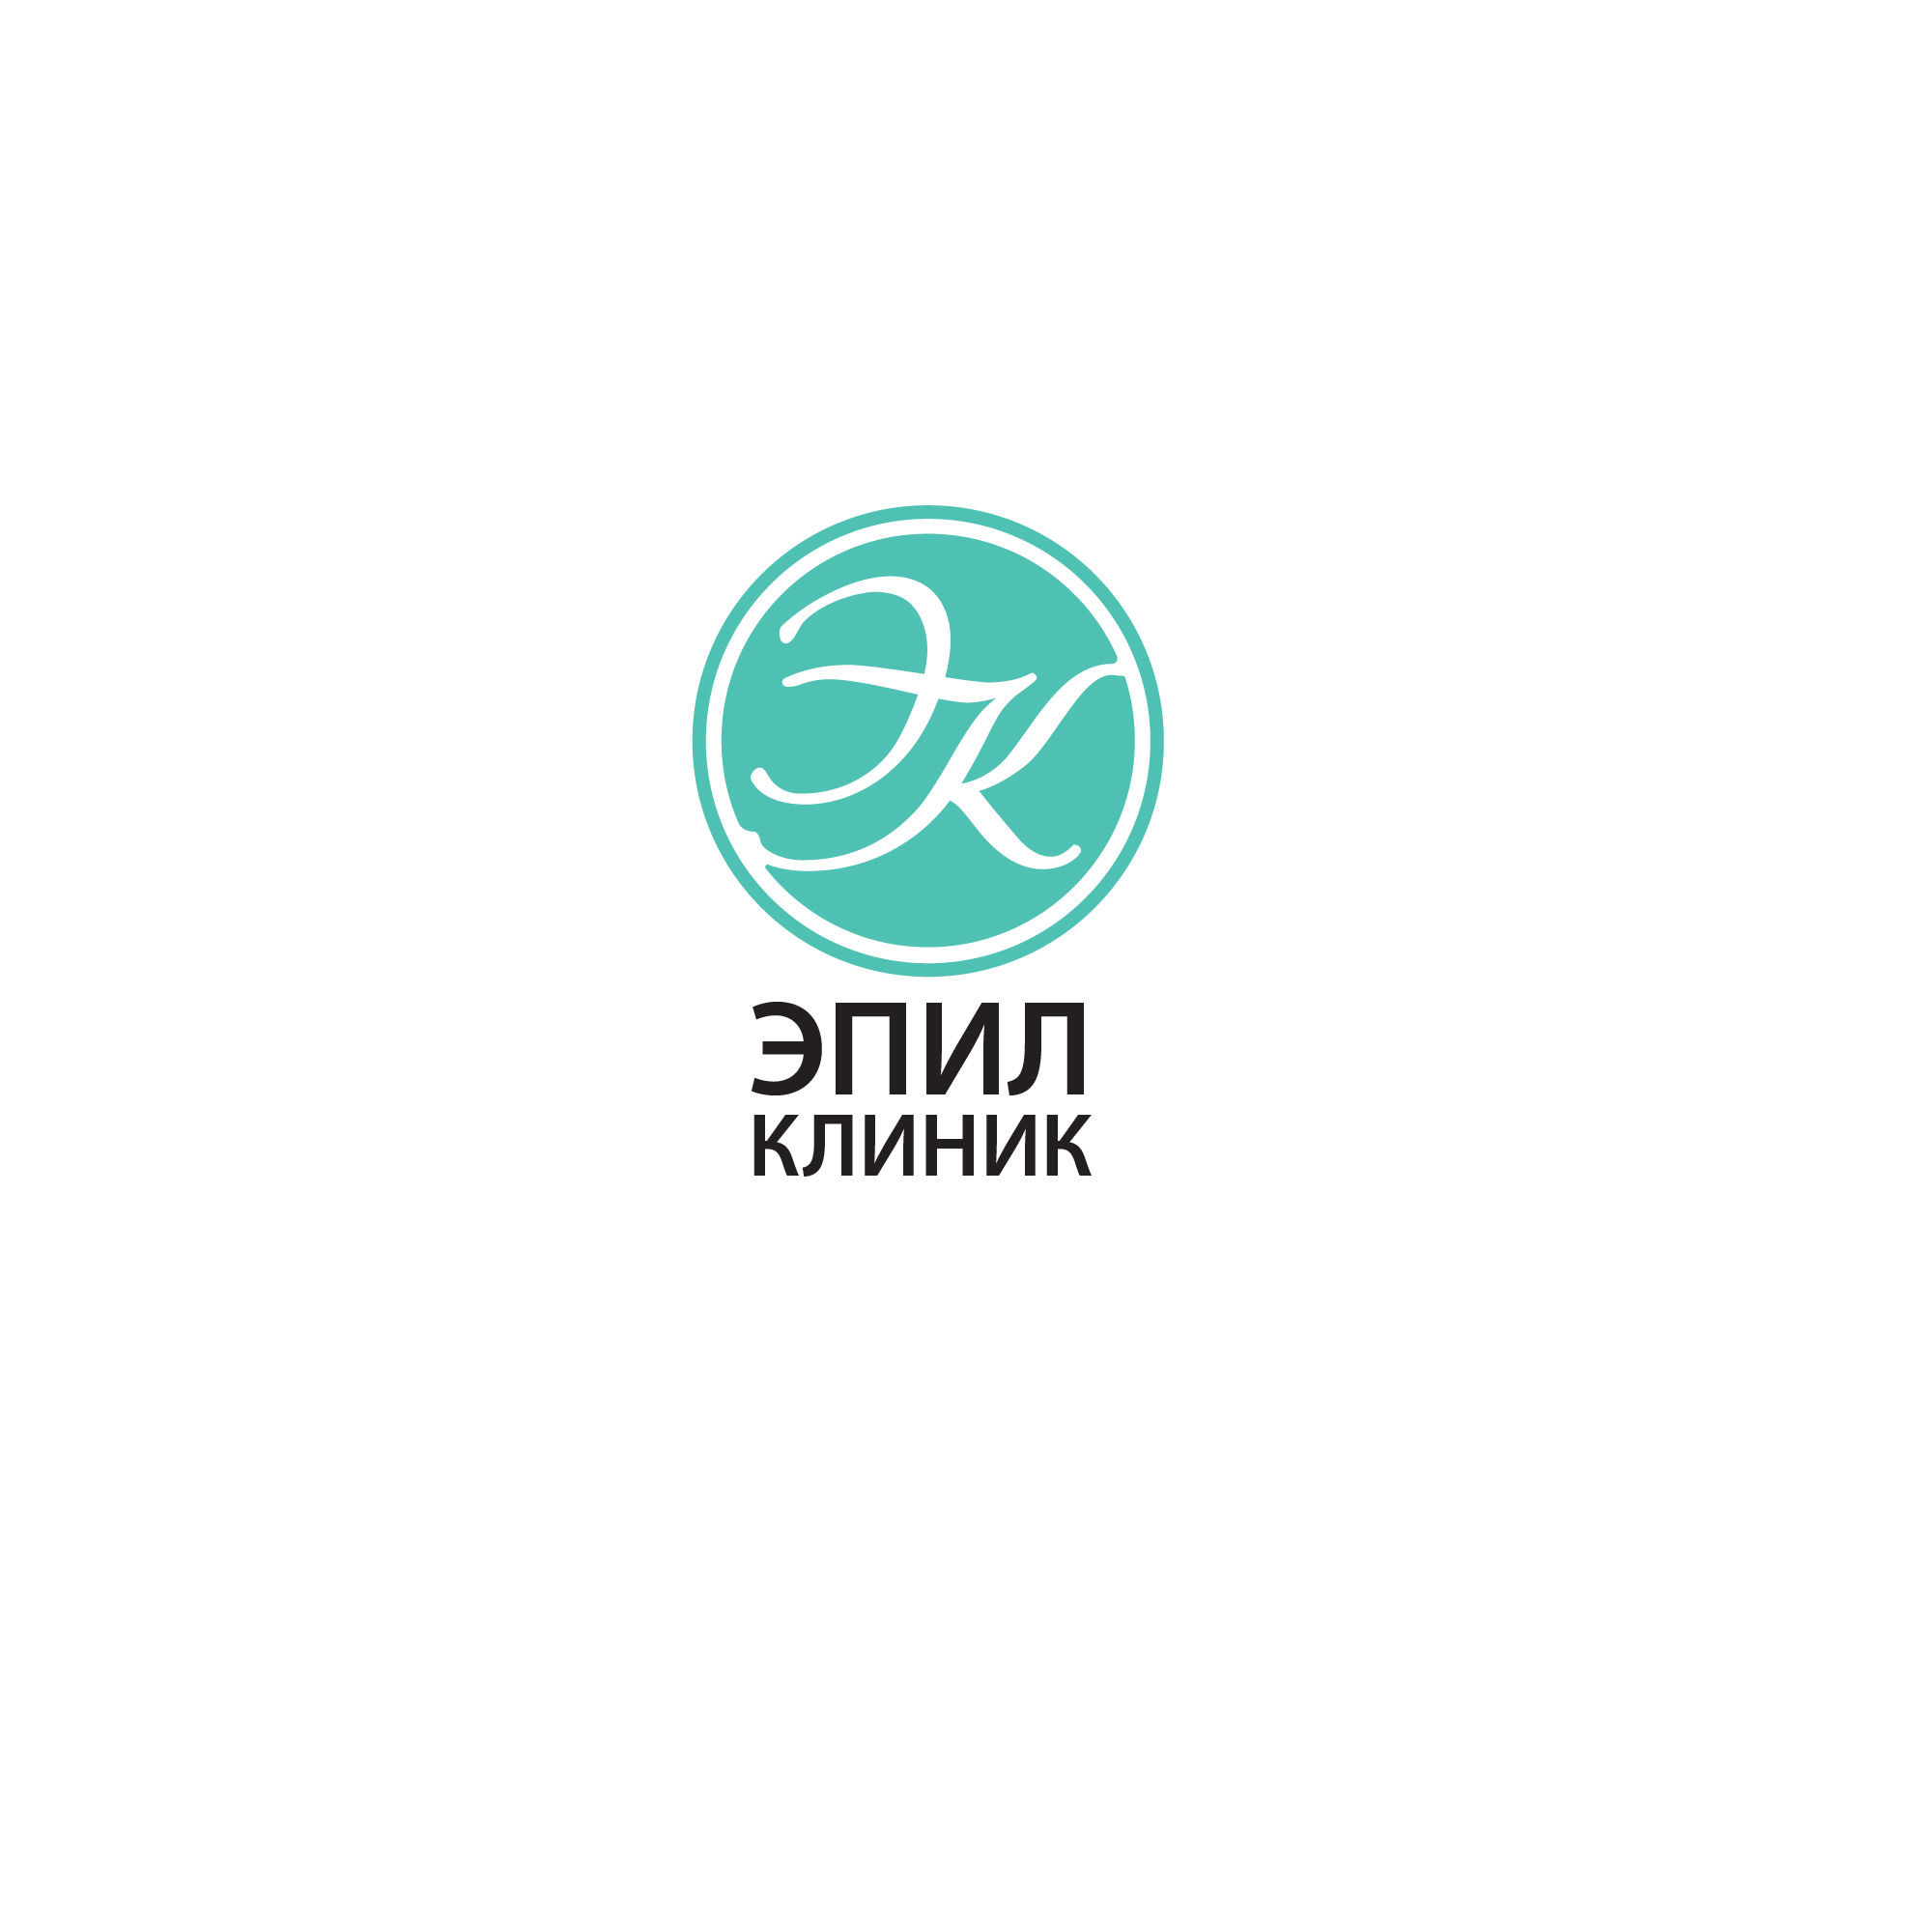 Логотип , фирменный стиль  фото f_6535e1ac19b78ee9.jpg